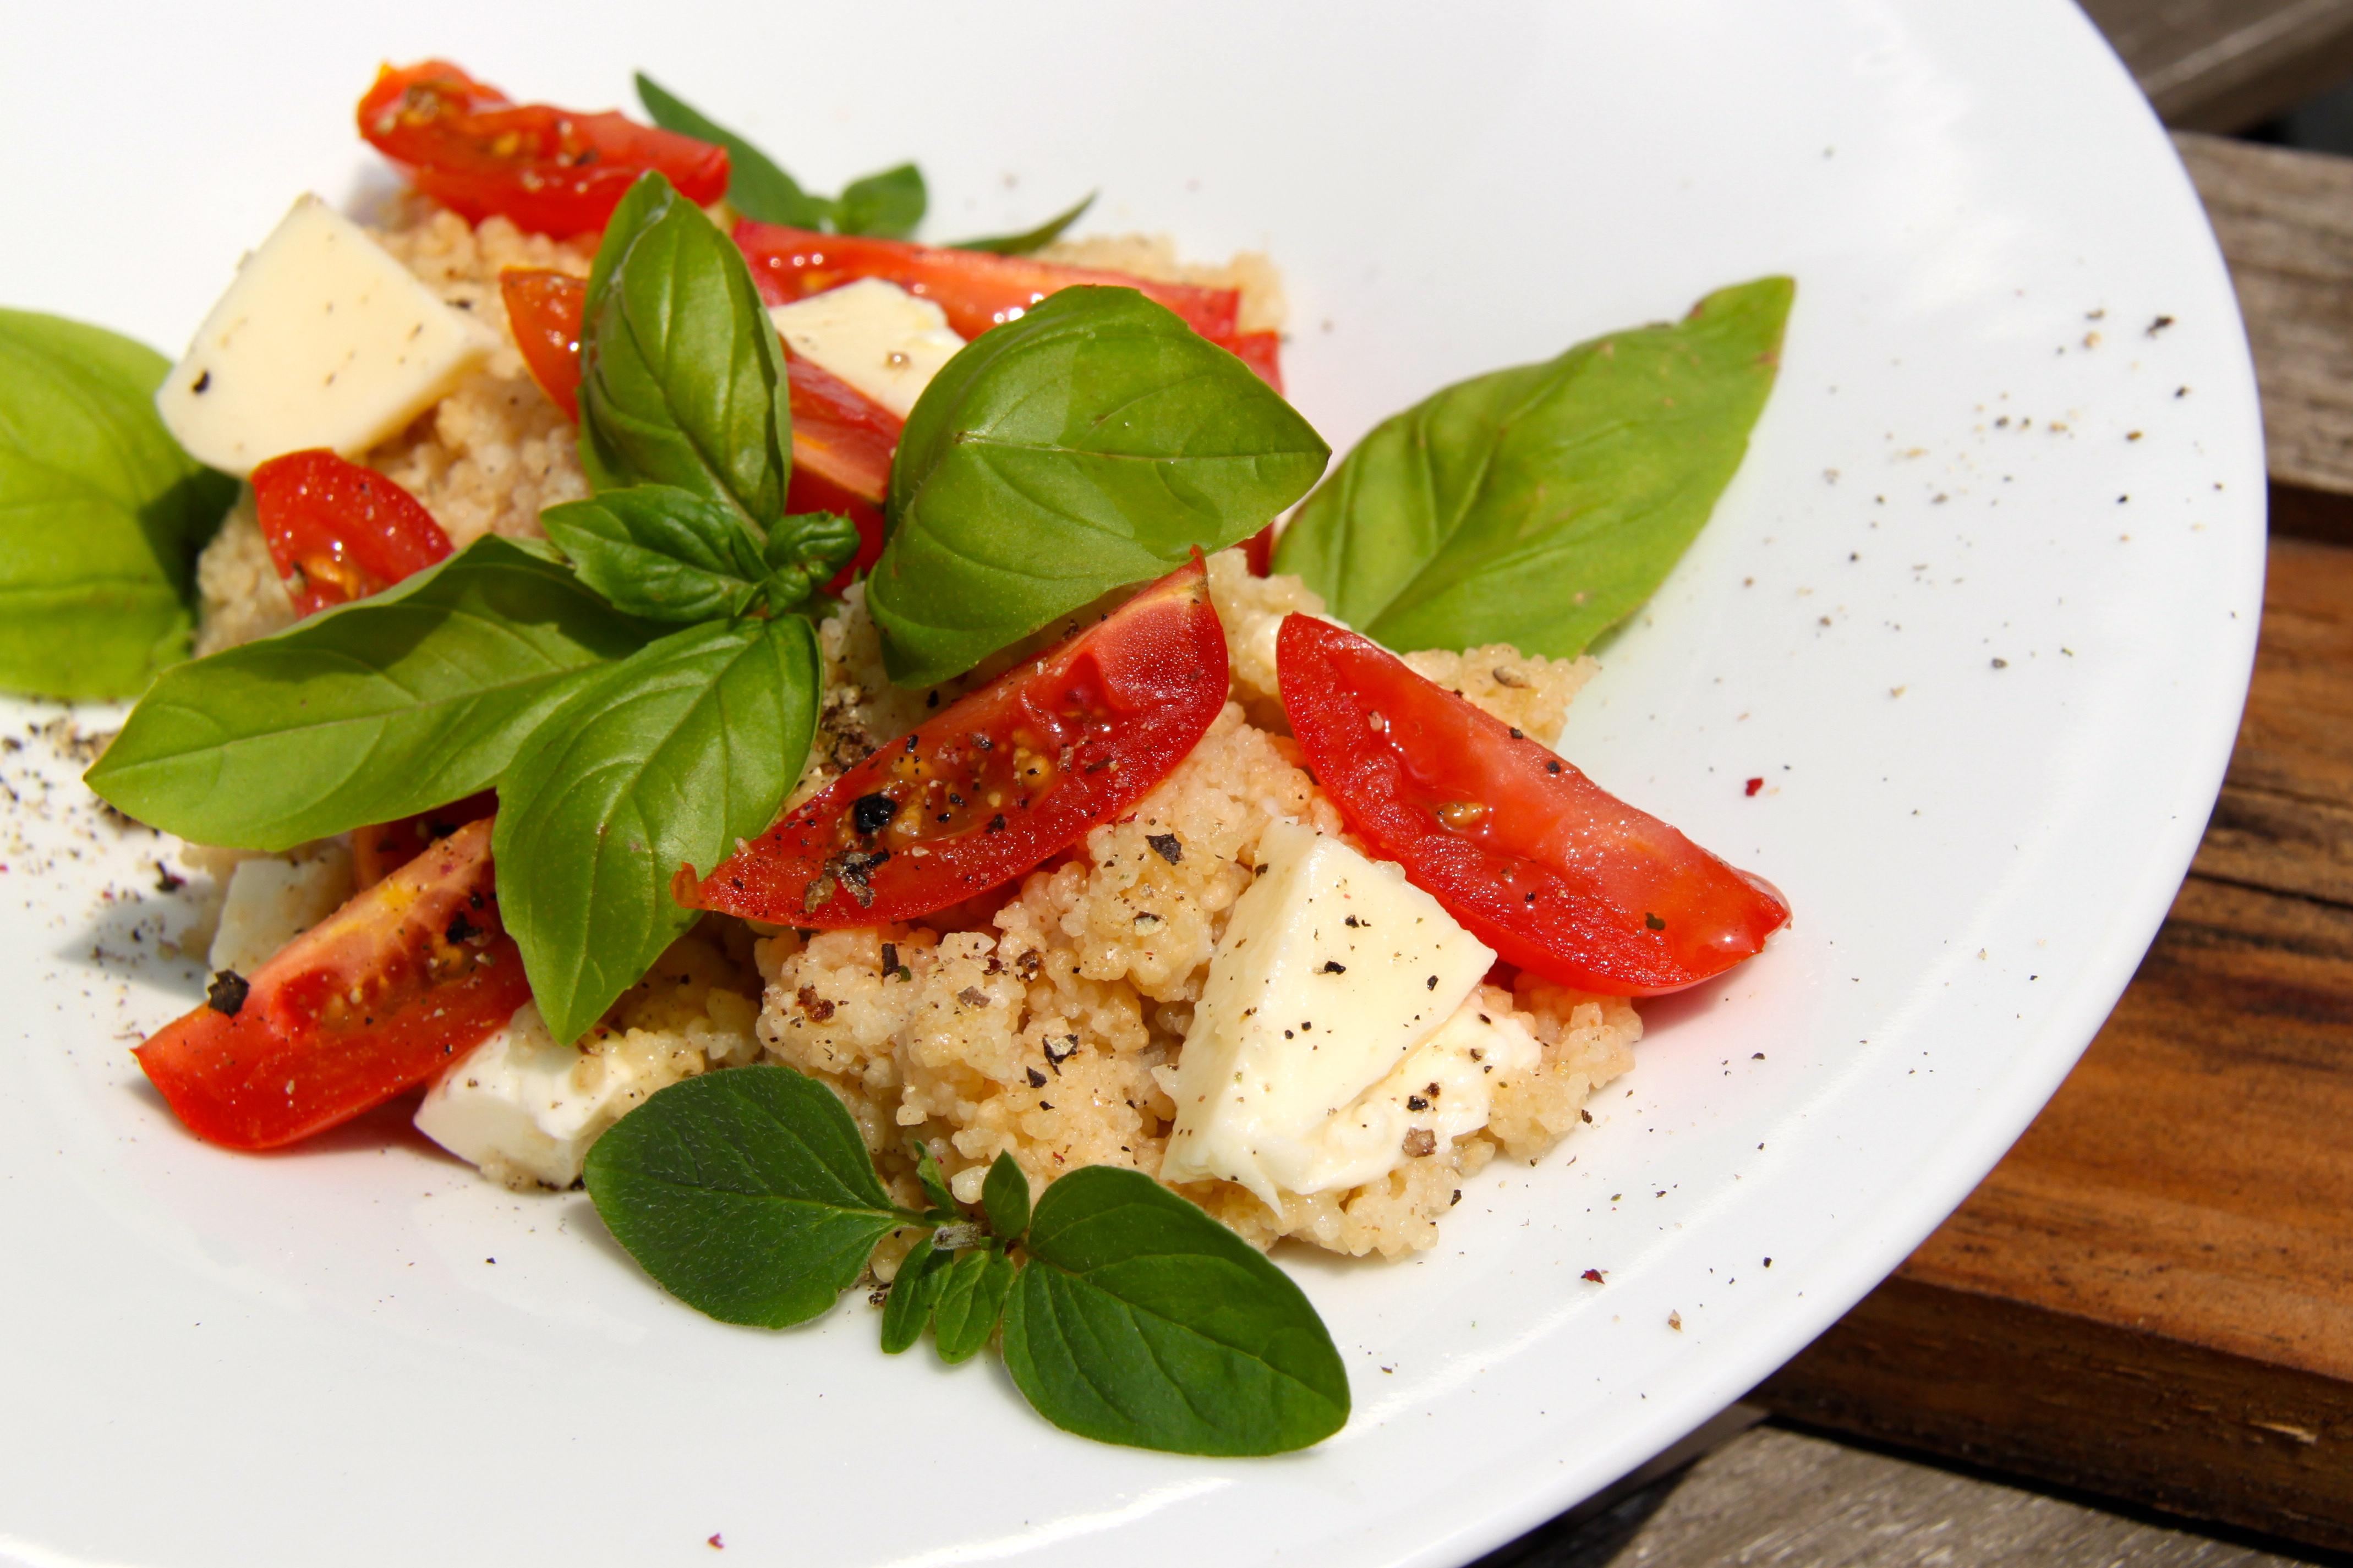 rita bringt 39 s couscous salat mit tomaten und mozzarella. Black Bedroom Furniture Sets. Home Design Ideas